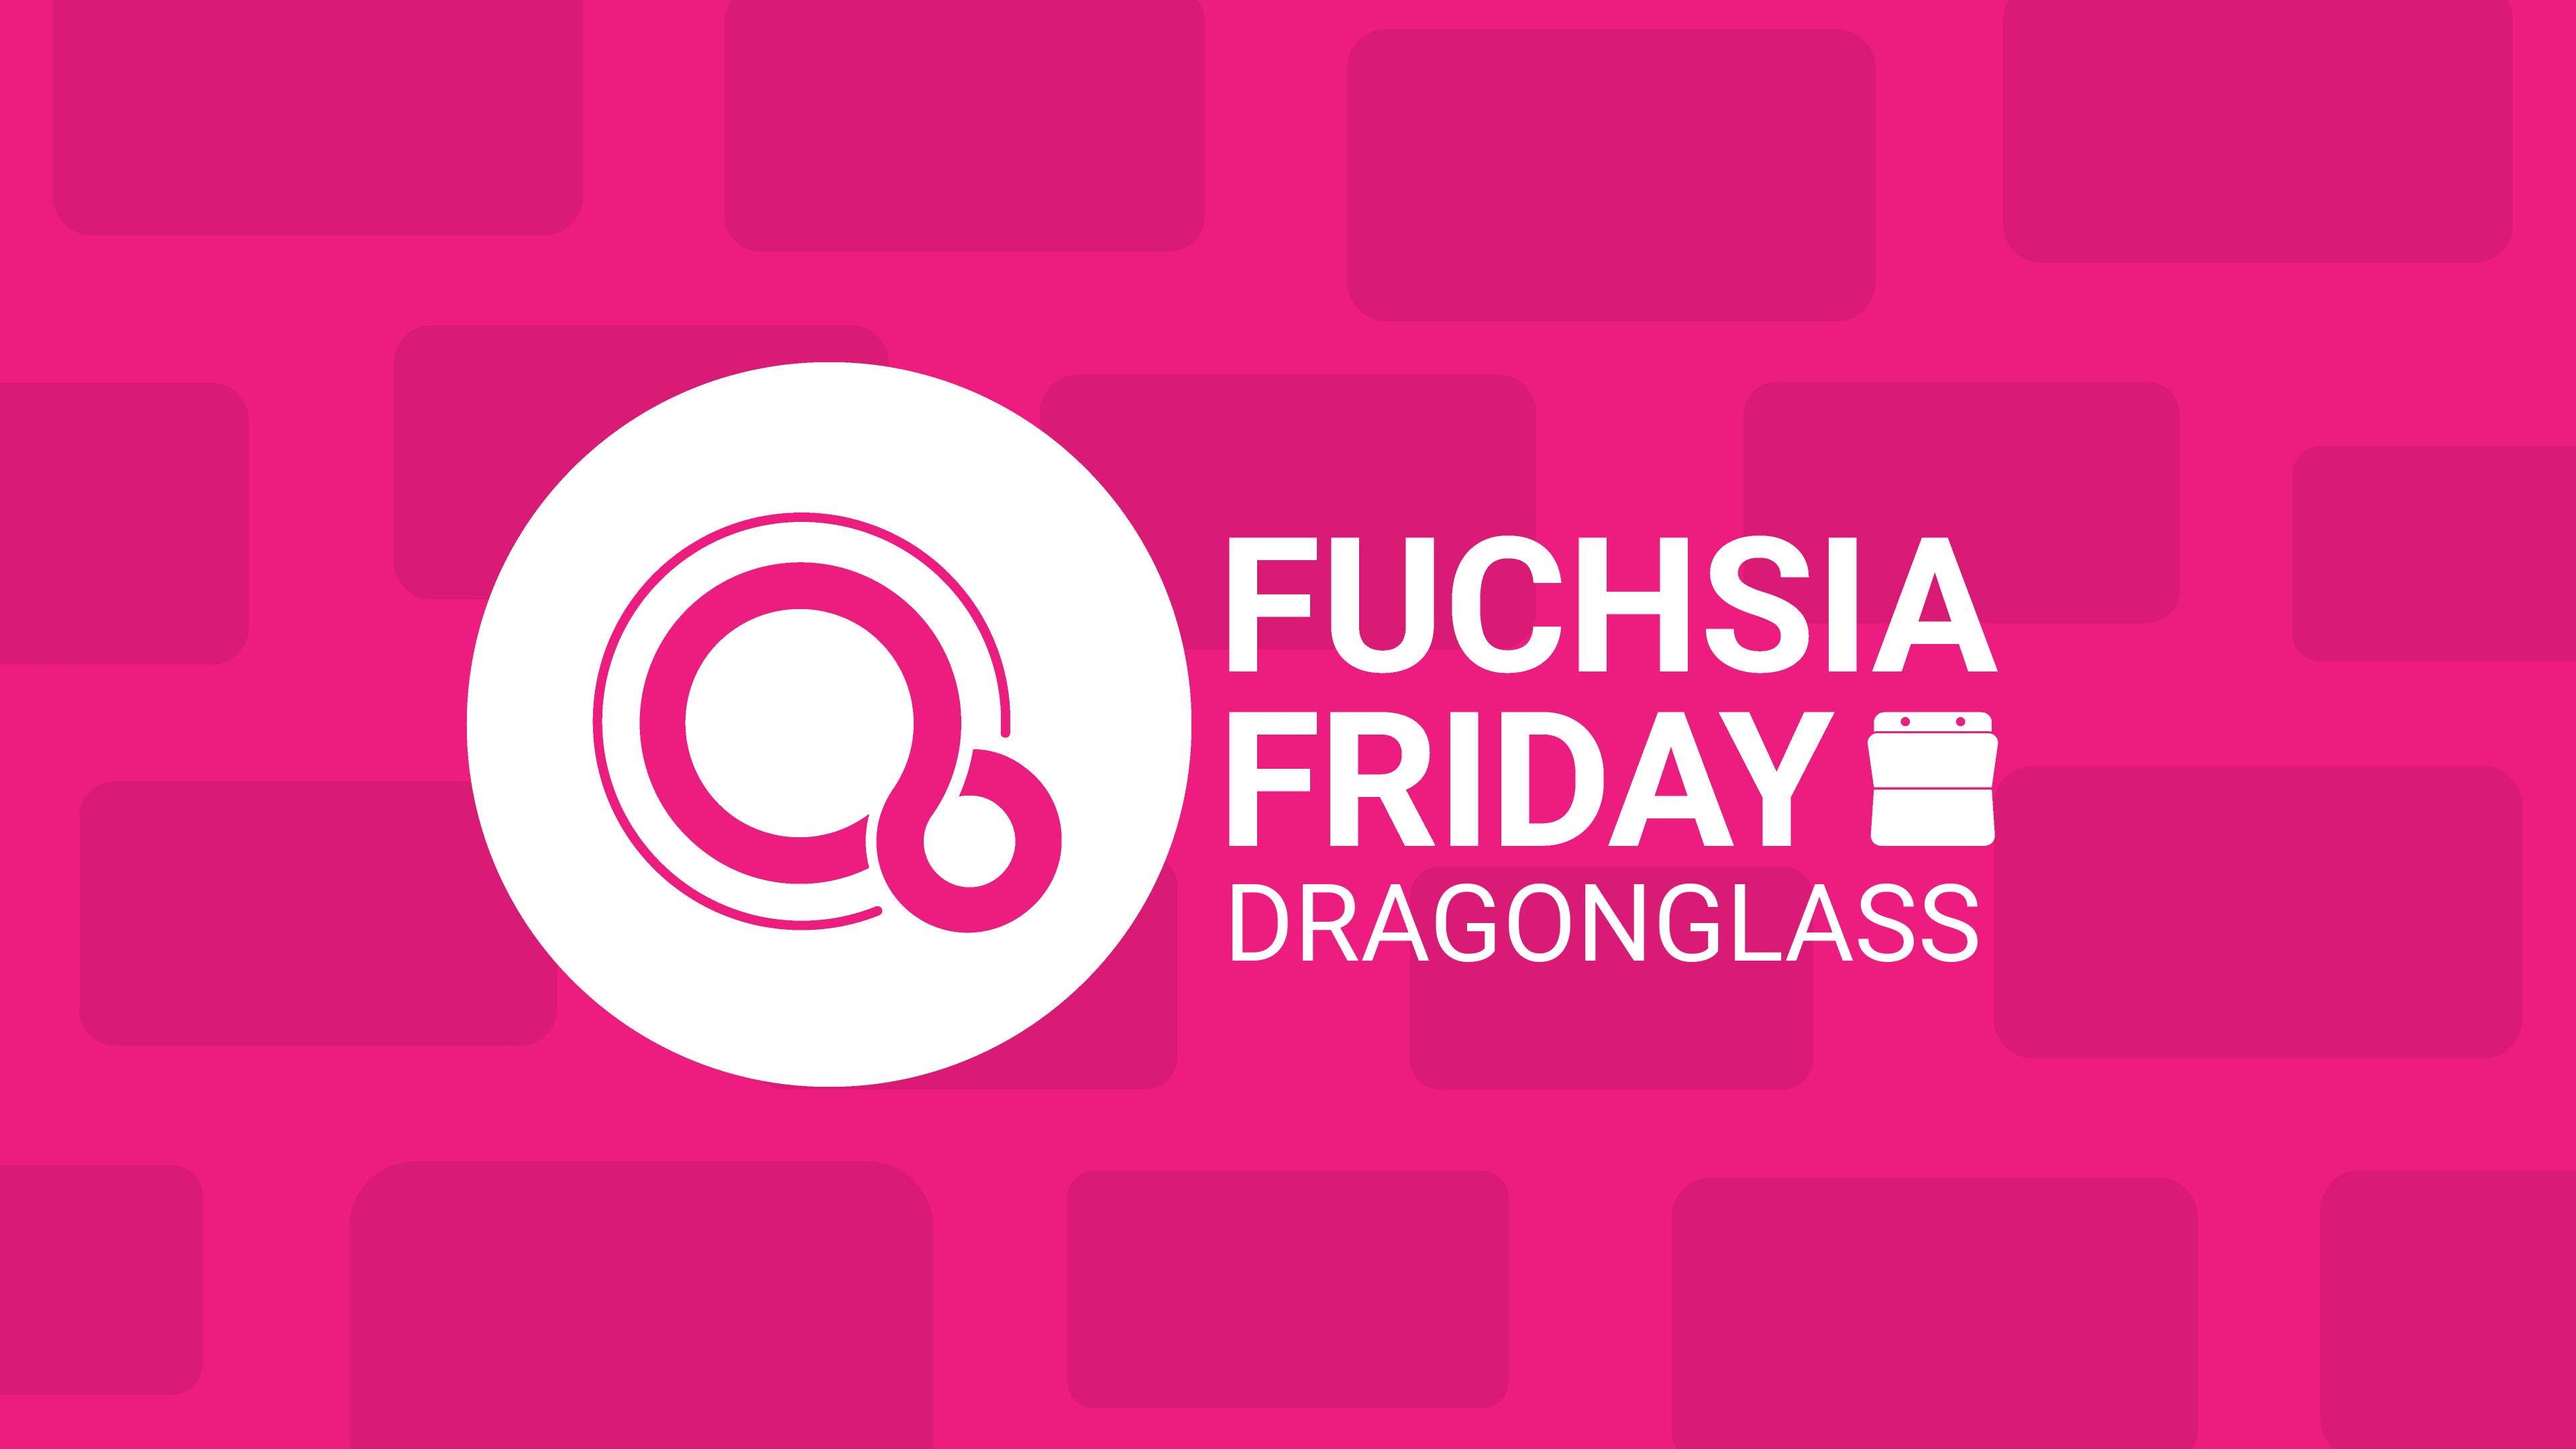 Fuchsia Friday: Das Rätsel um Dragonglass in Android, Chromium und Fuchsia